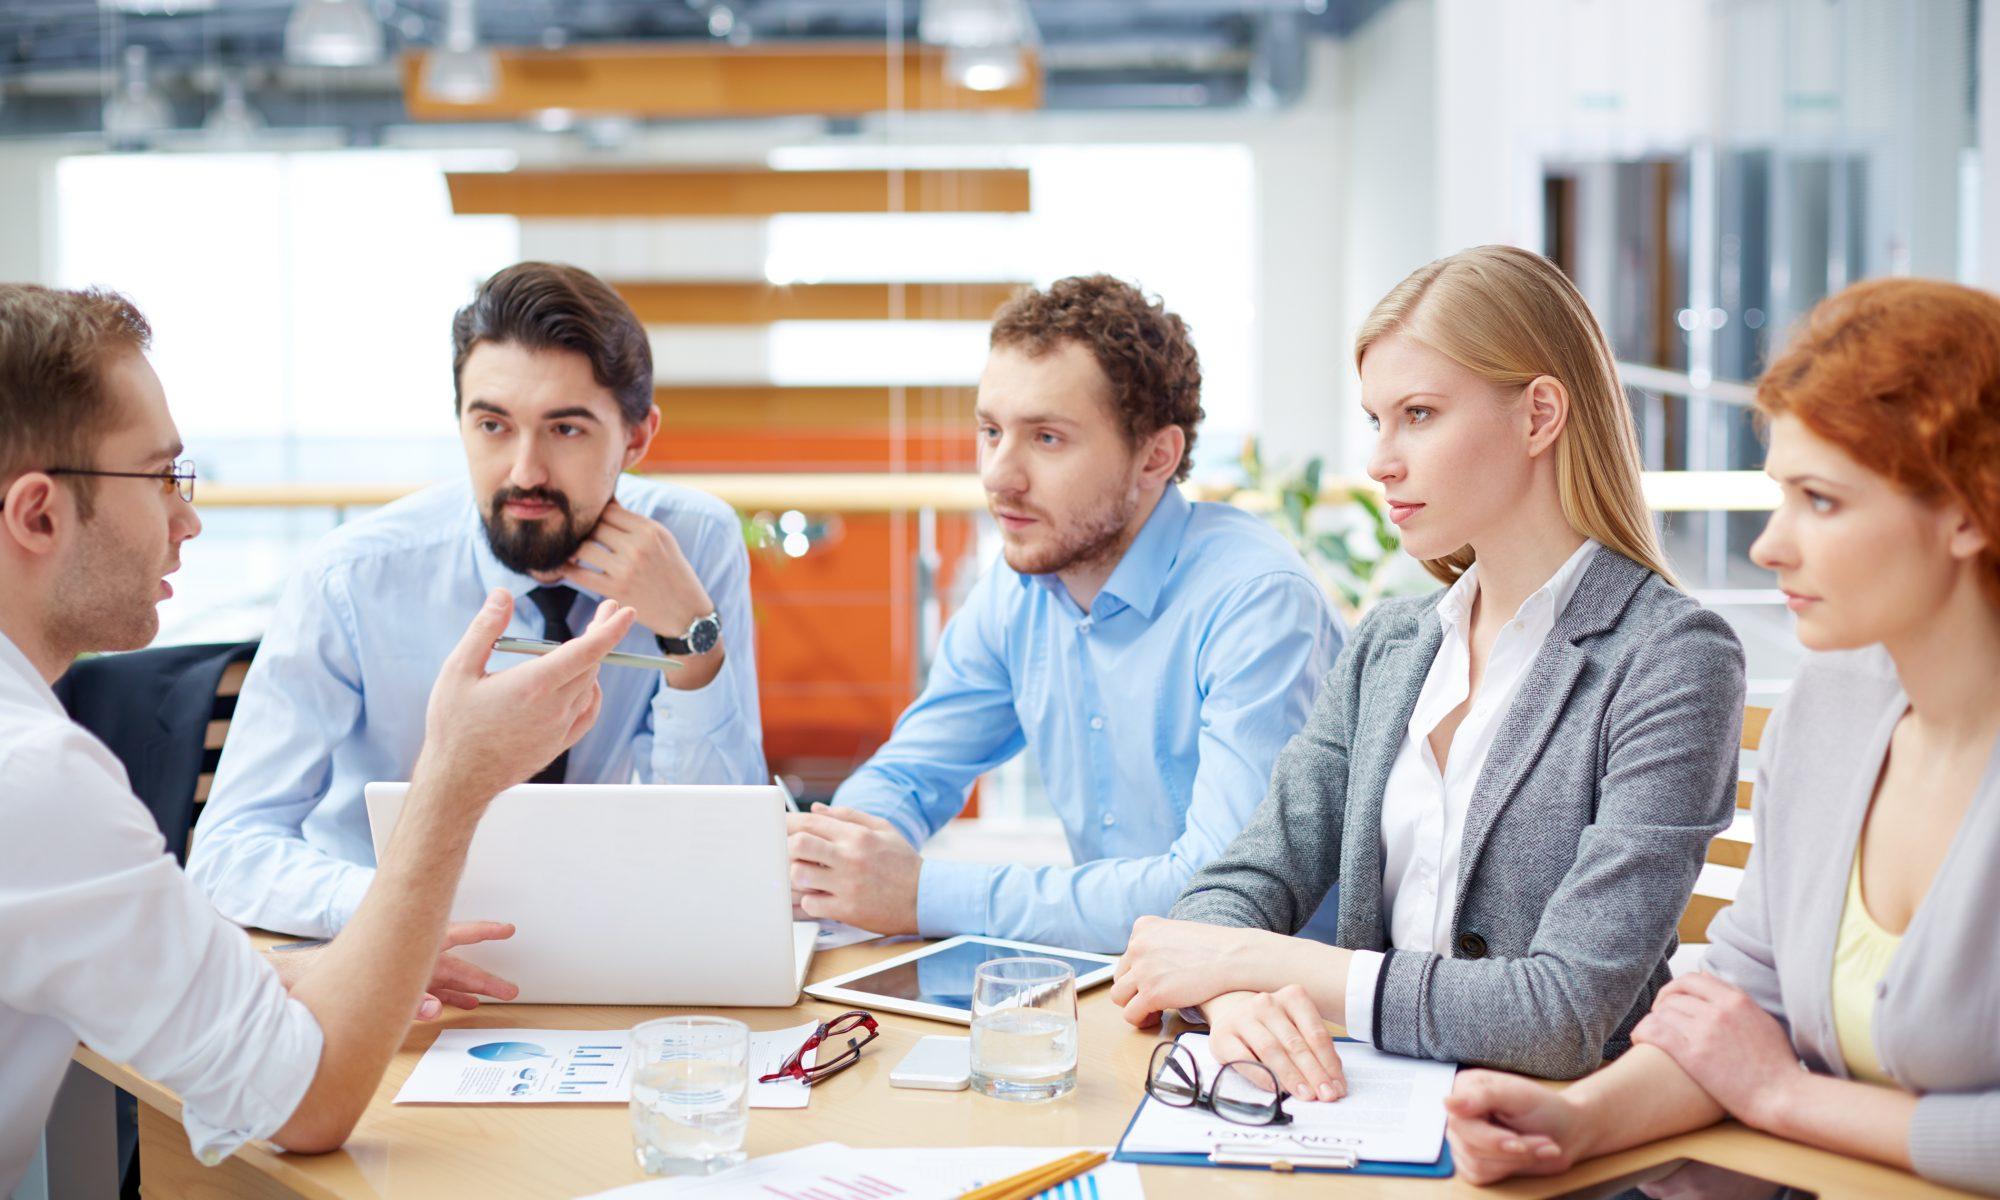 CMI leadership course for effective communication